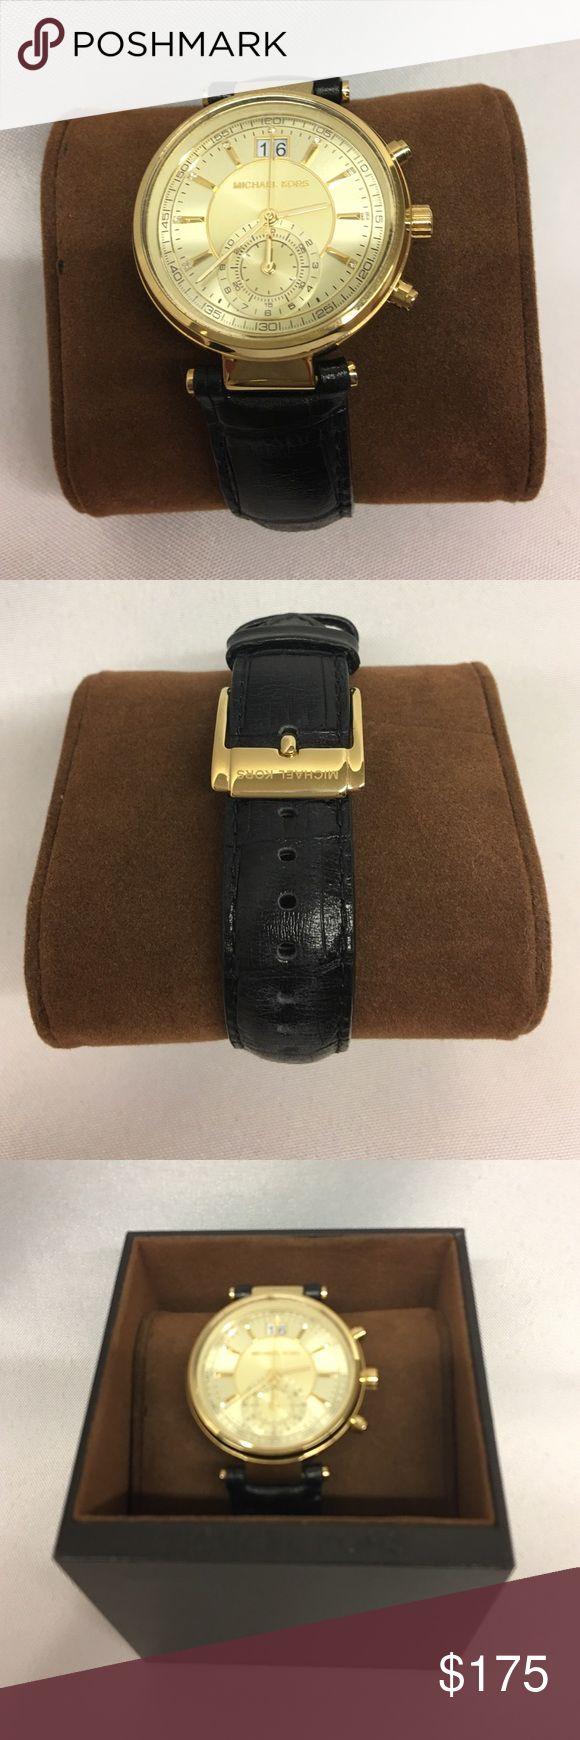 MK watch MK men's watch black leather bank, gold embellishments, never worn, NIB Michael Kors Jewelry